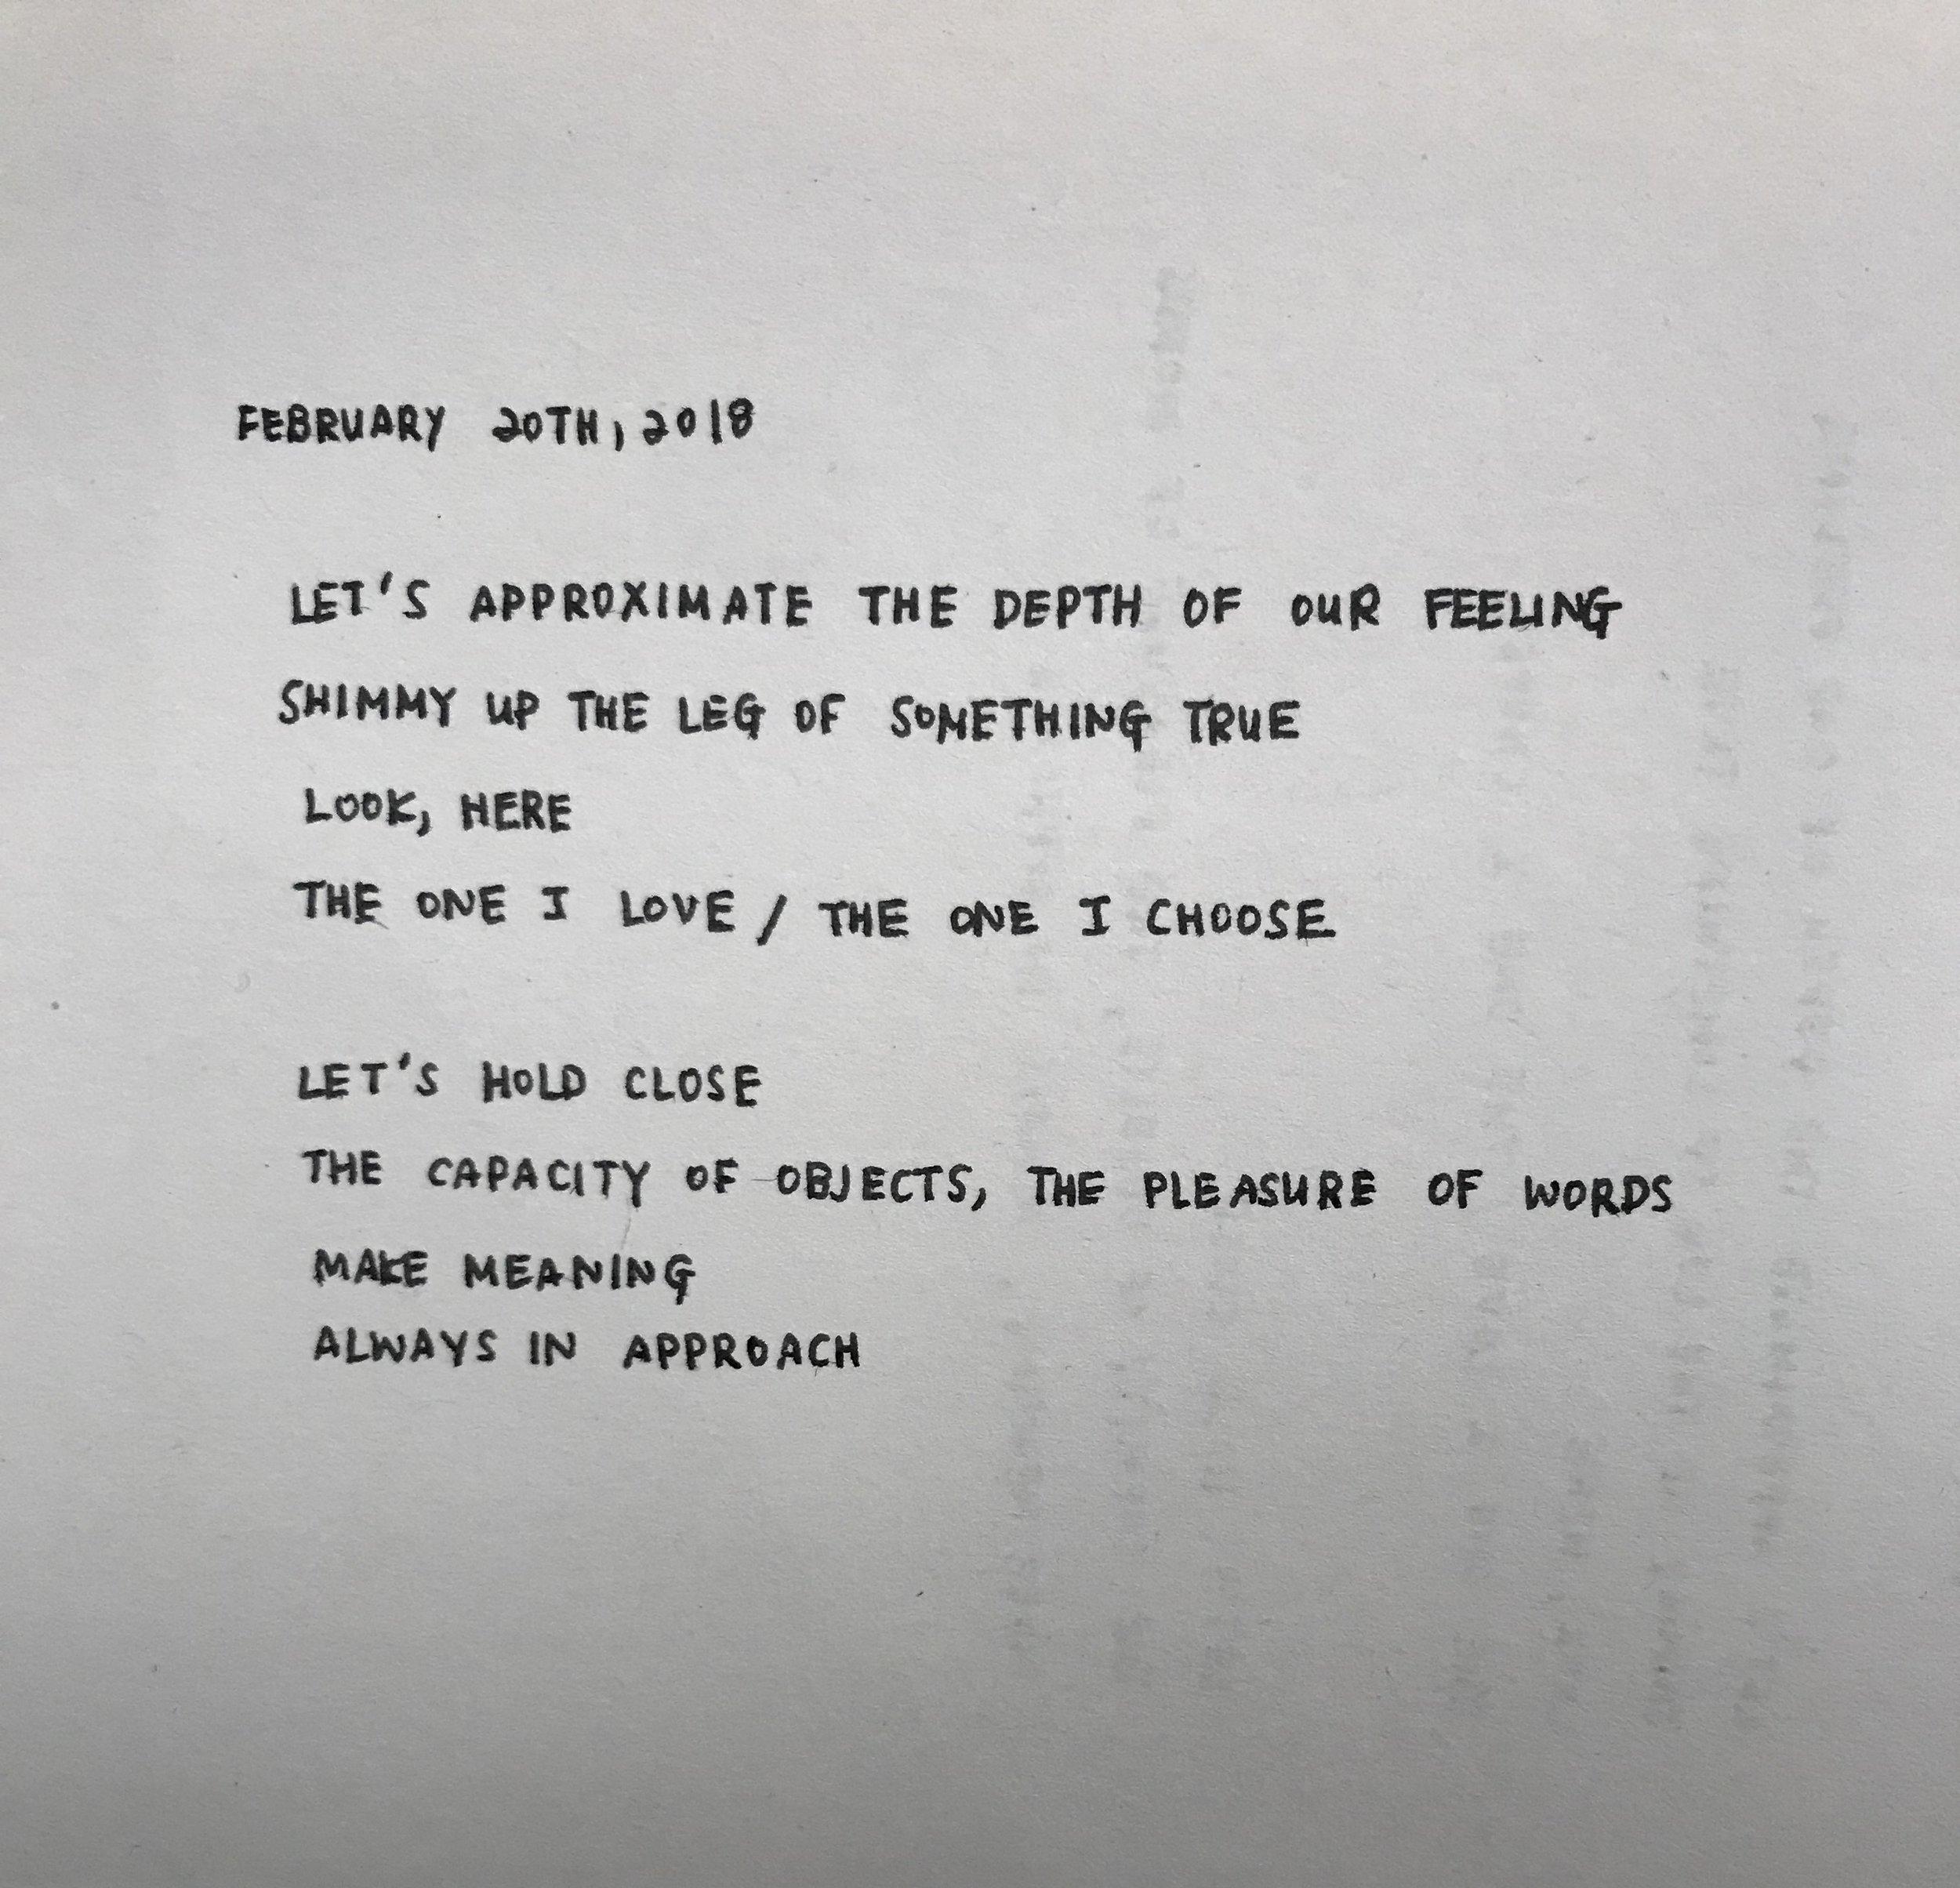 february 20th, 2018